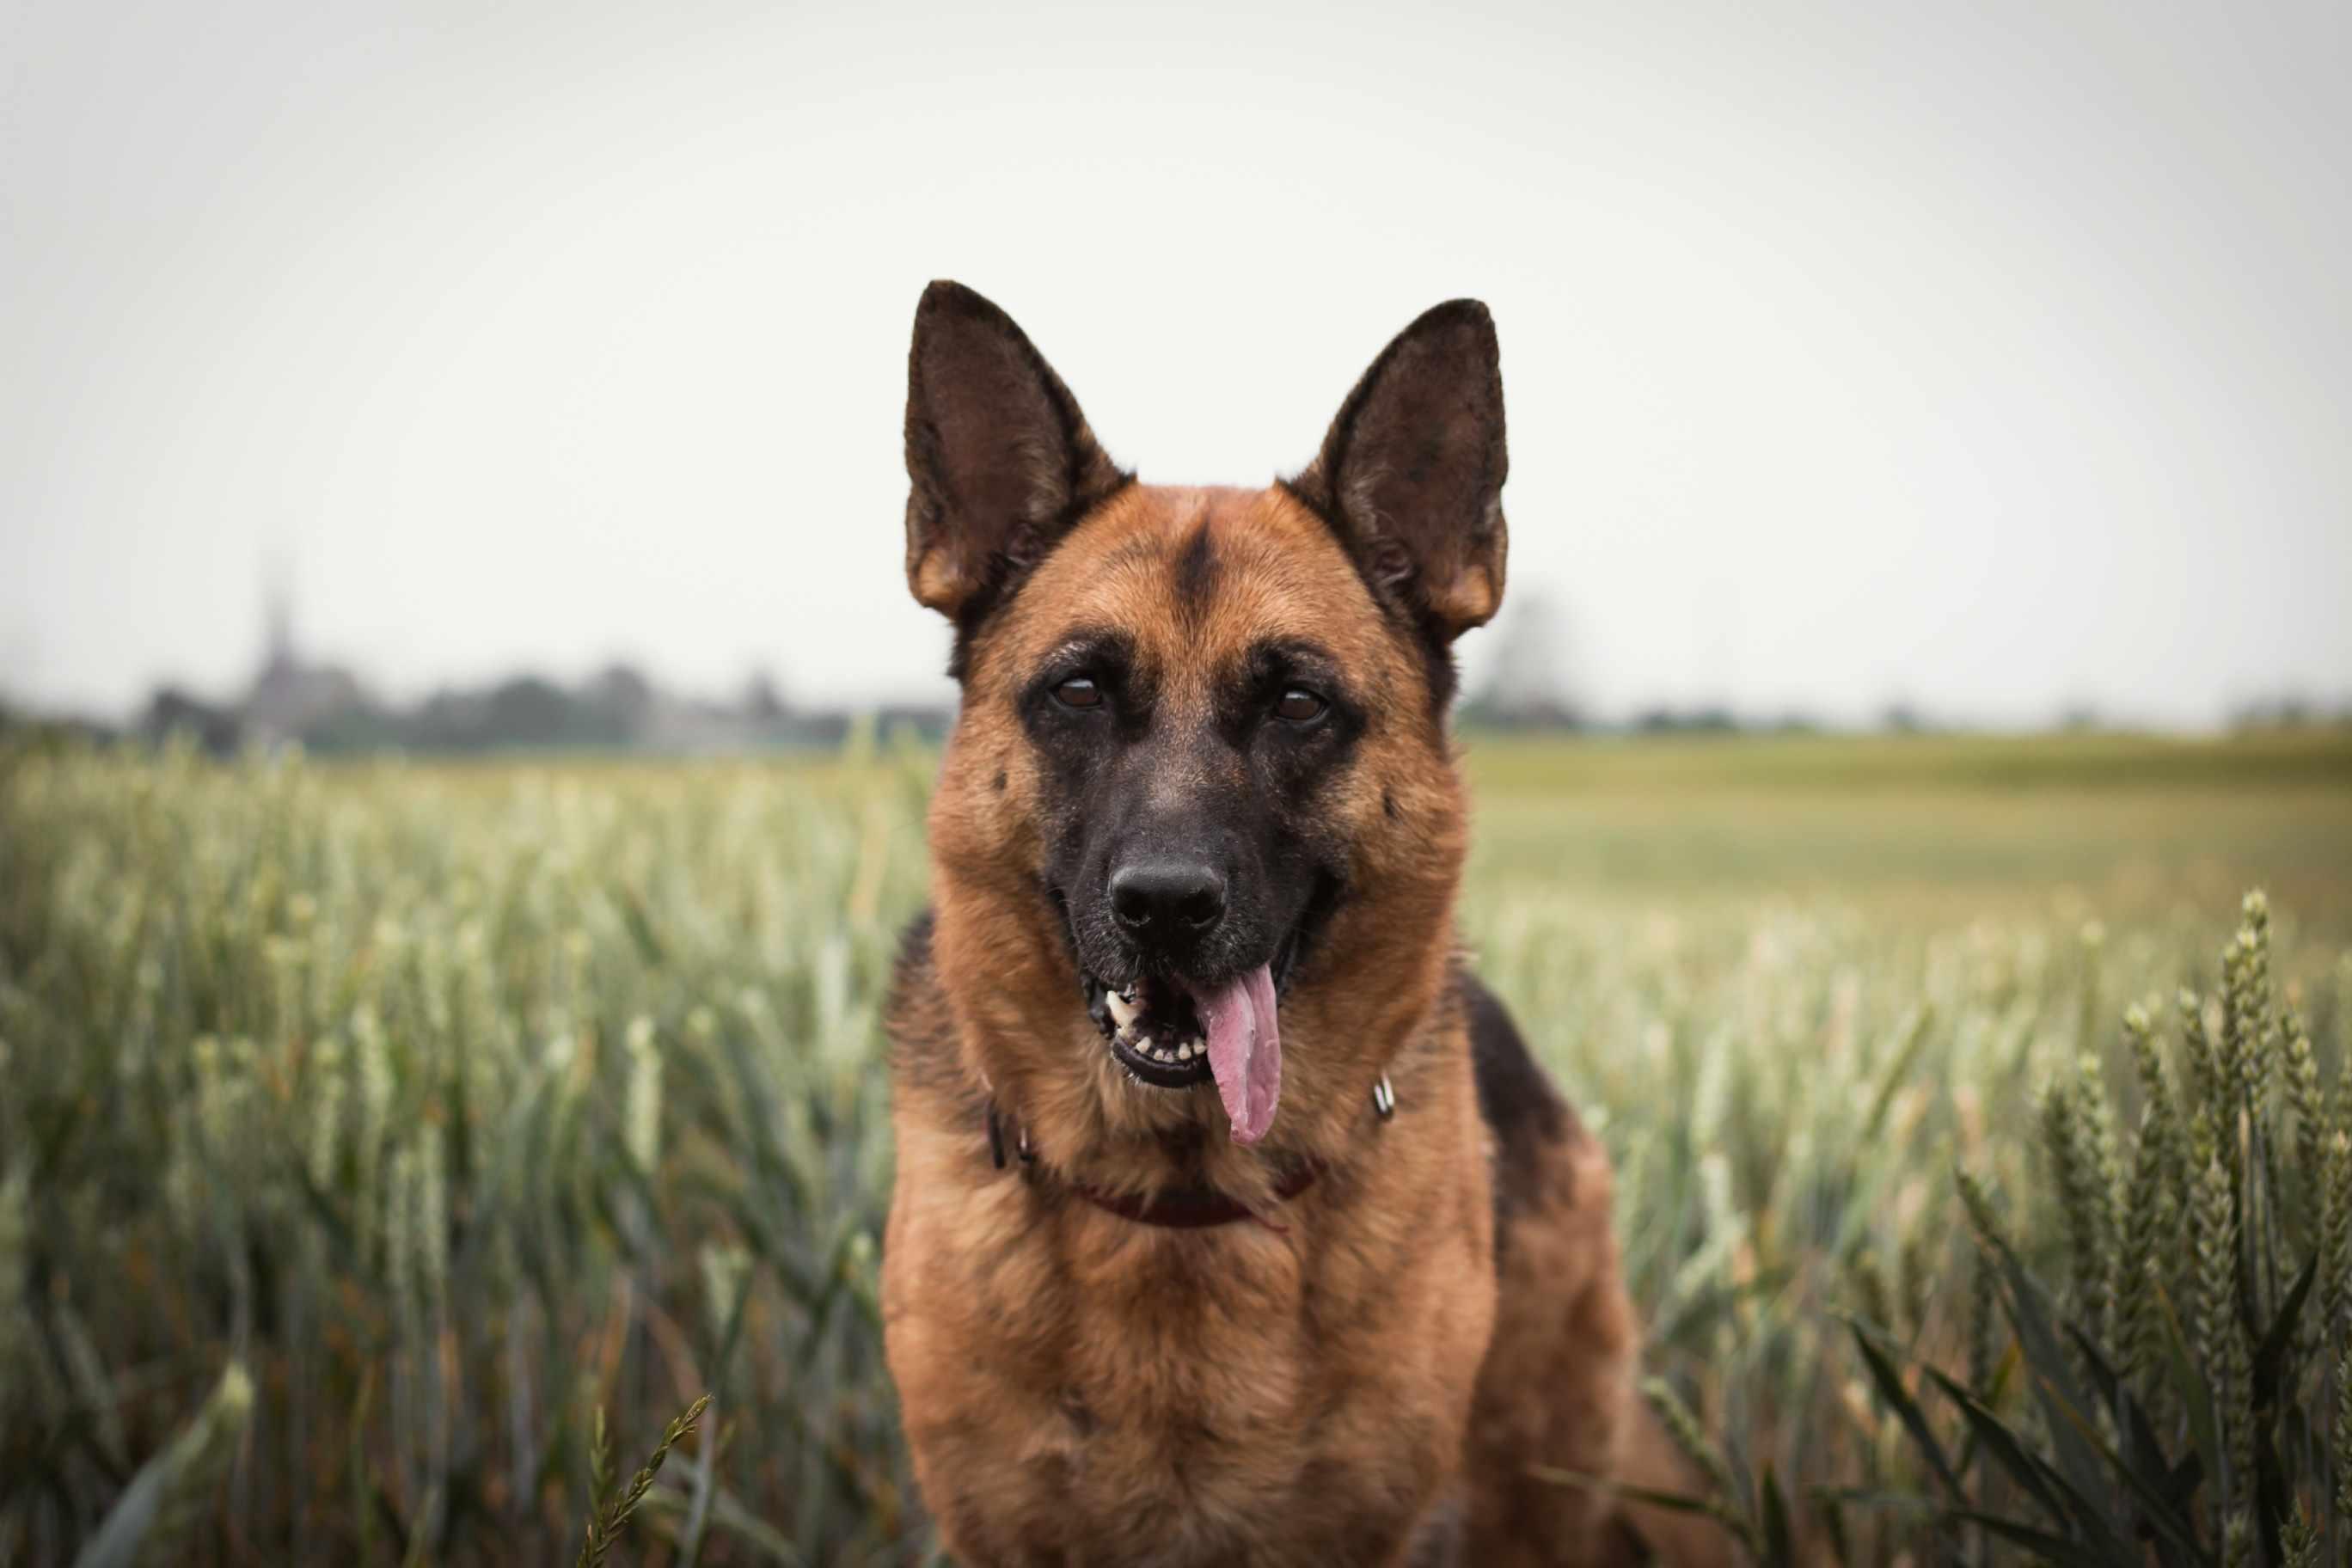 German shepherd standing in field